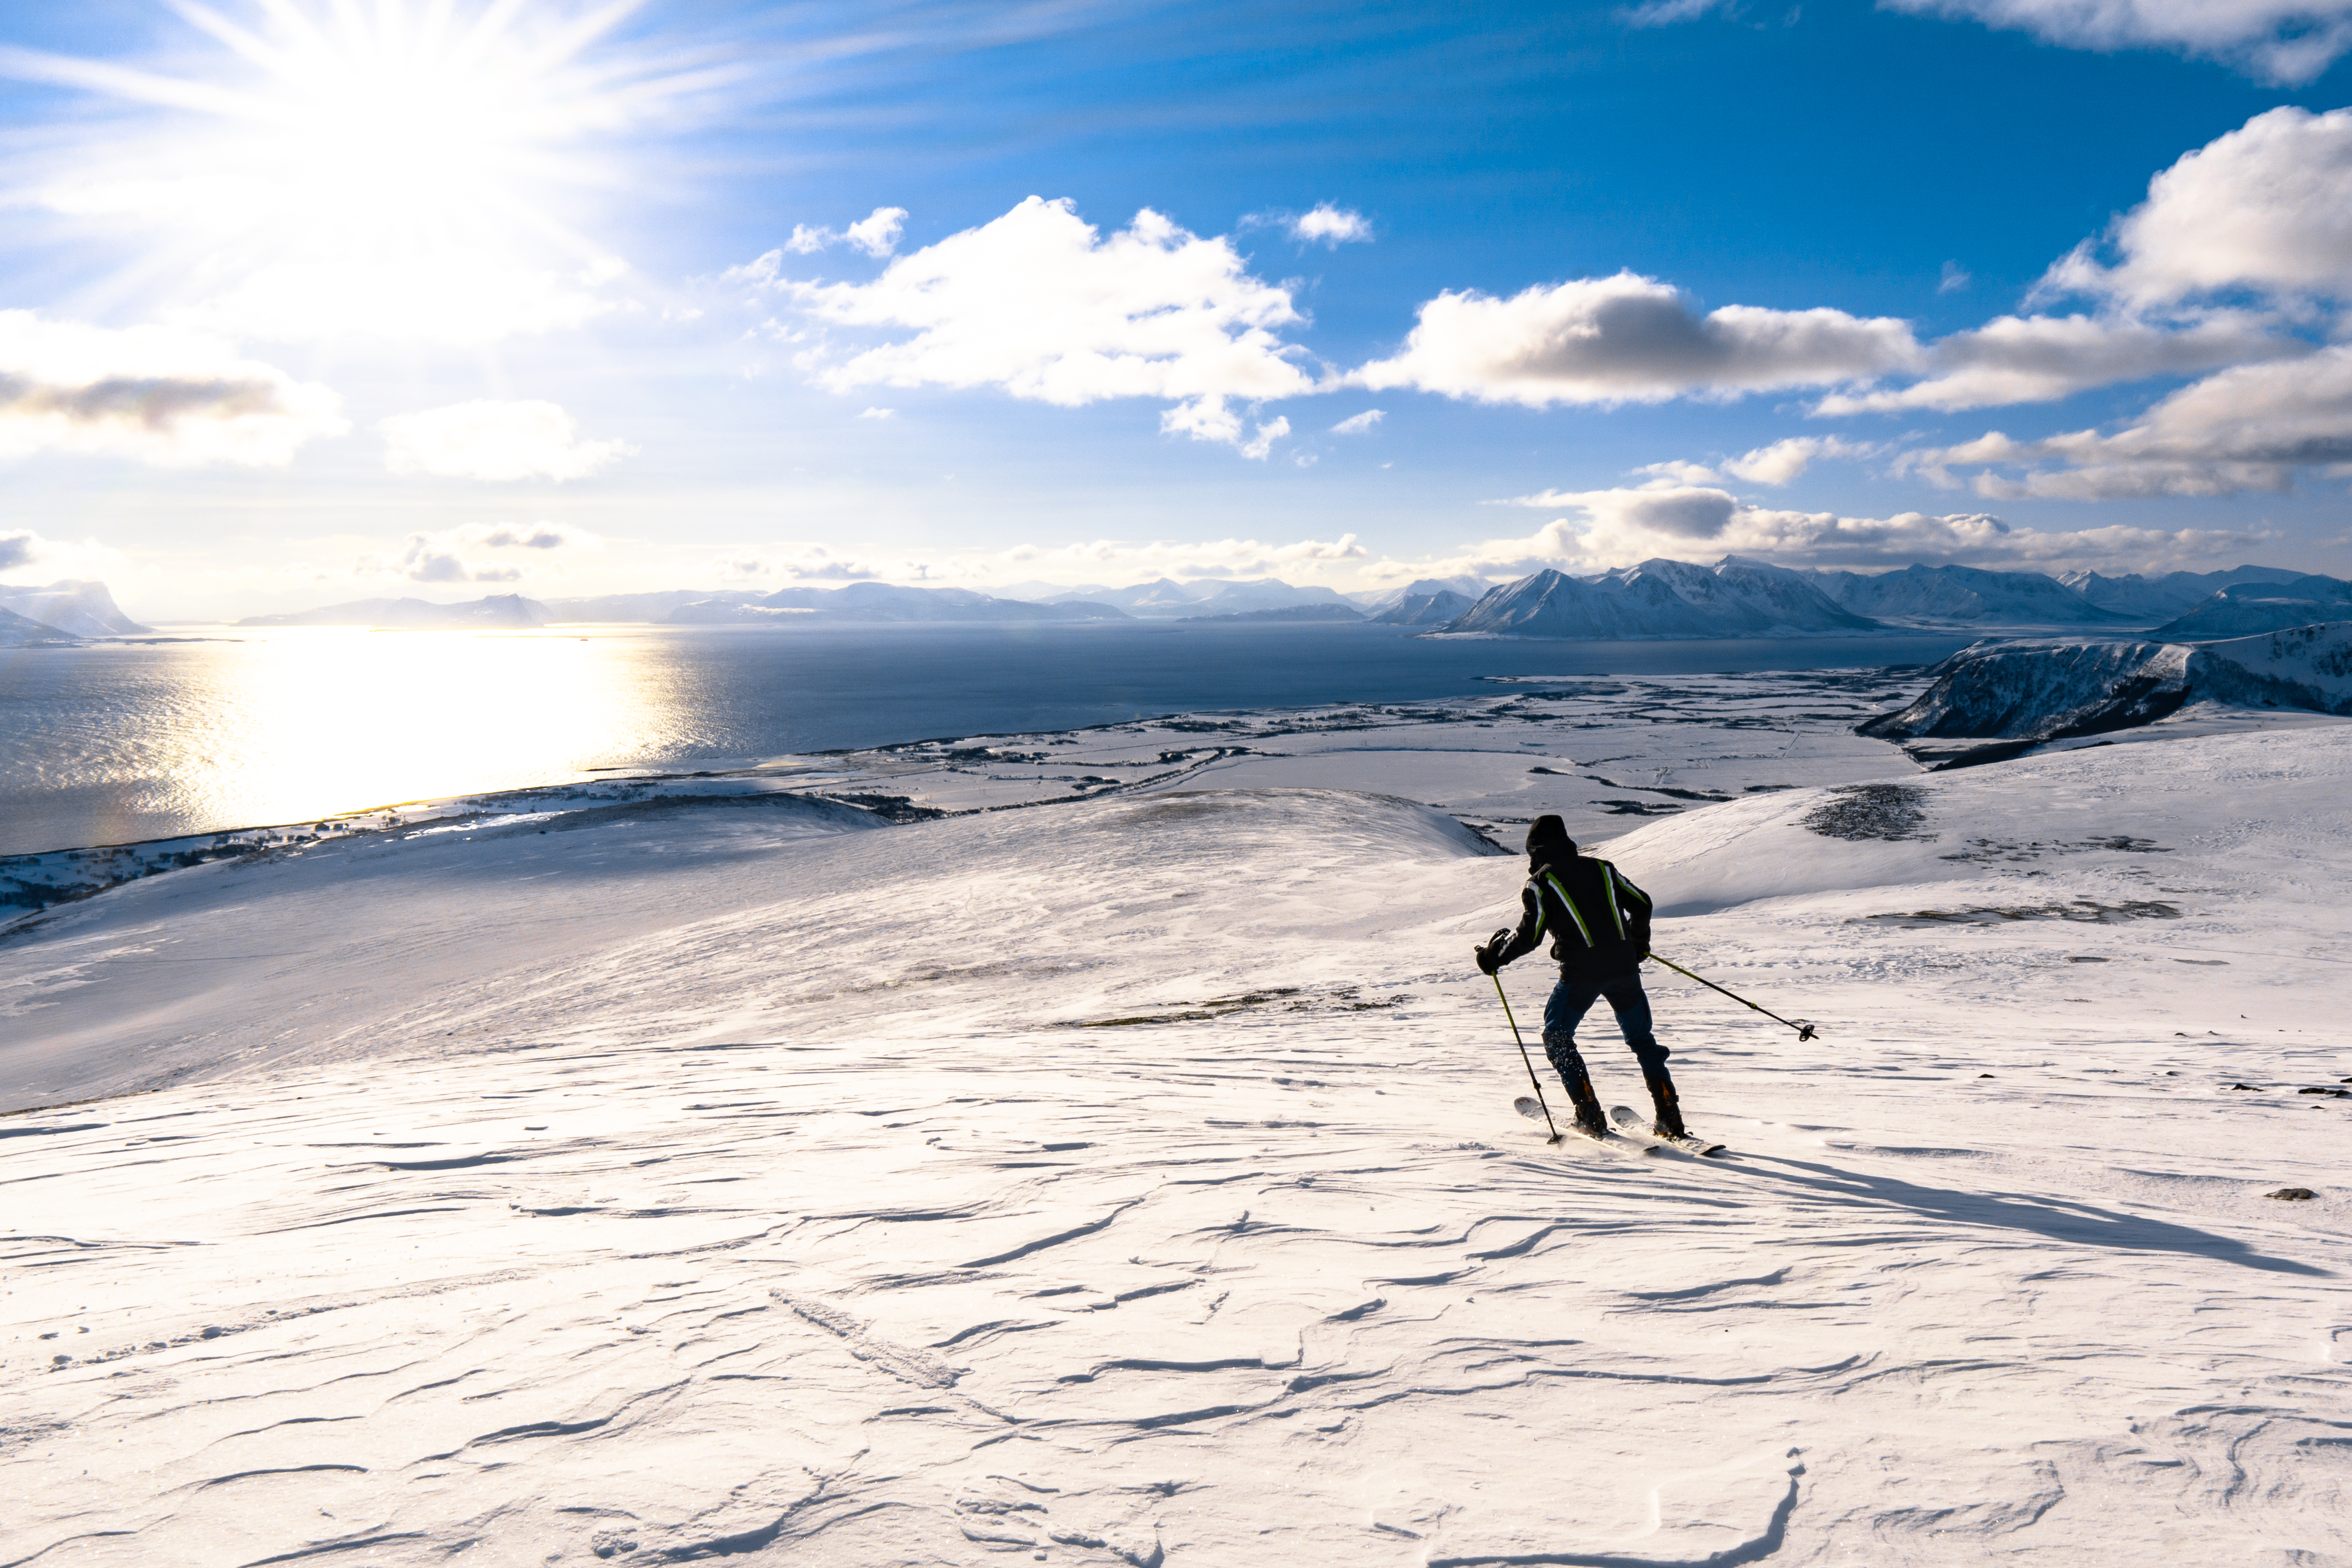 Man Skiing on Snowy Mountains of Norway Free Stock Photo